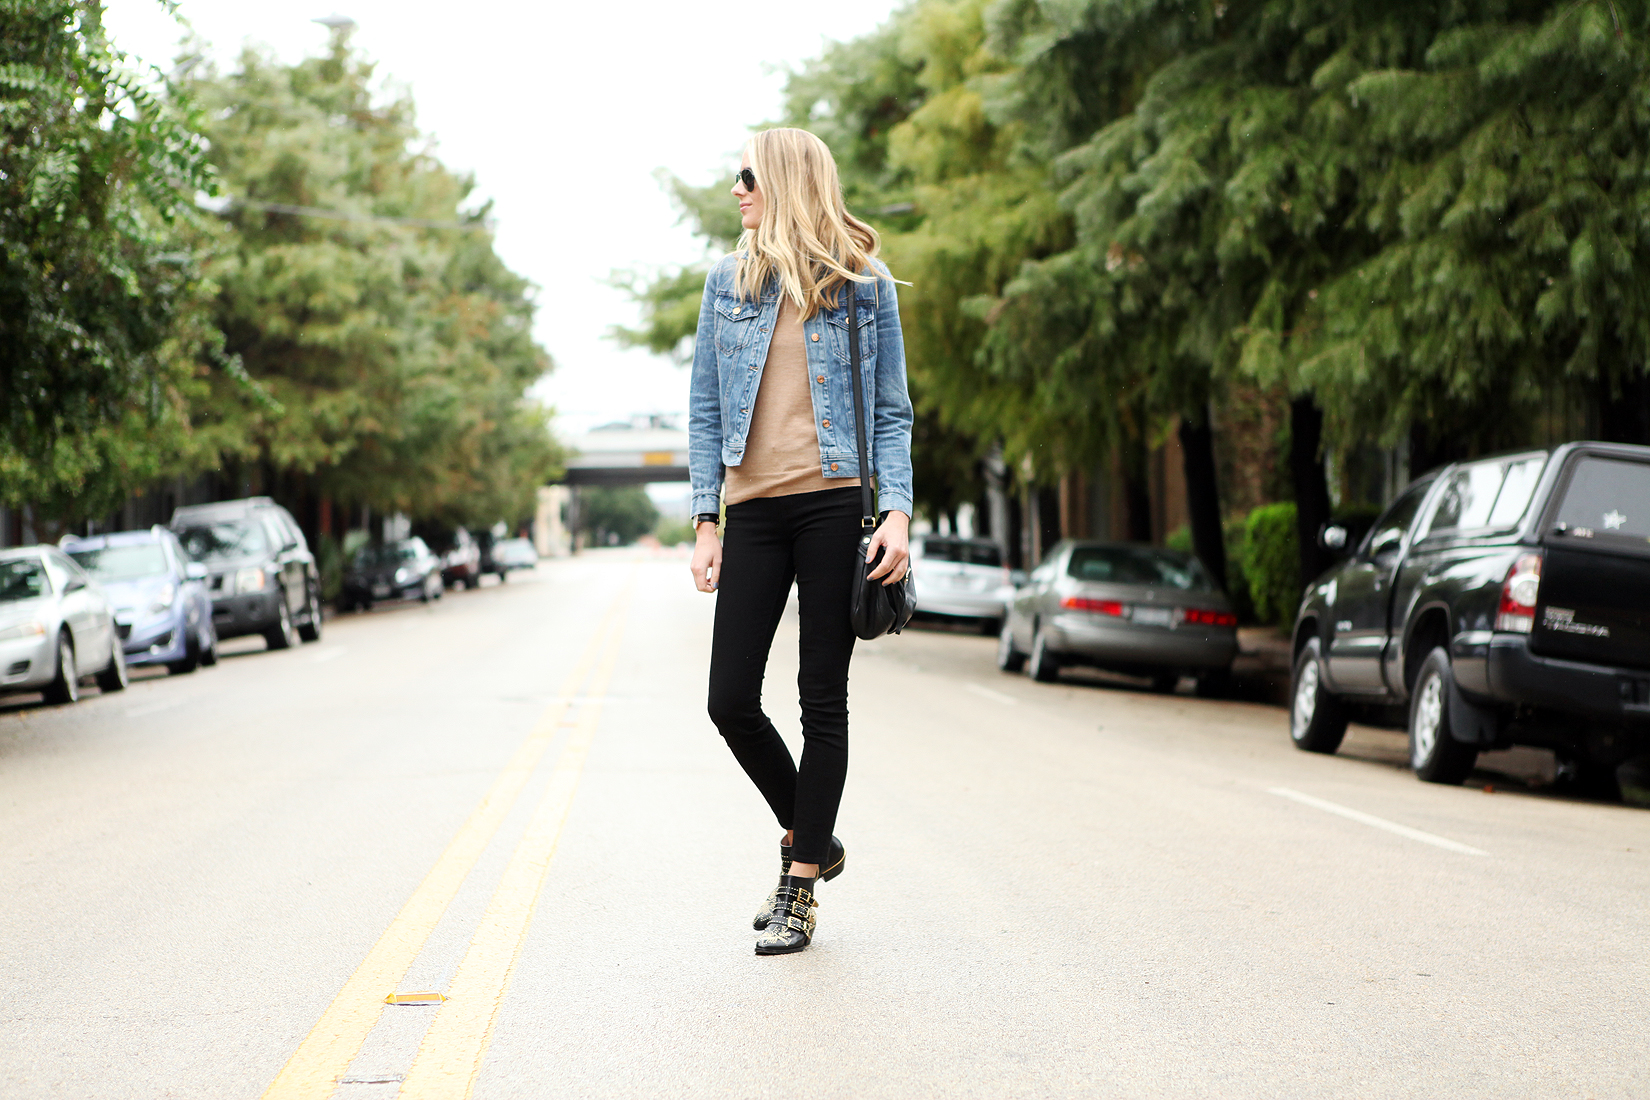 fashion-jackson-black-skinny-jeans-denim-jacket-tan-sweater-chloe-susanna-booties